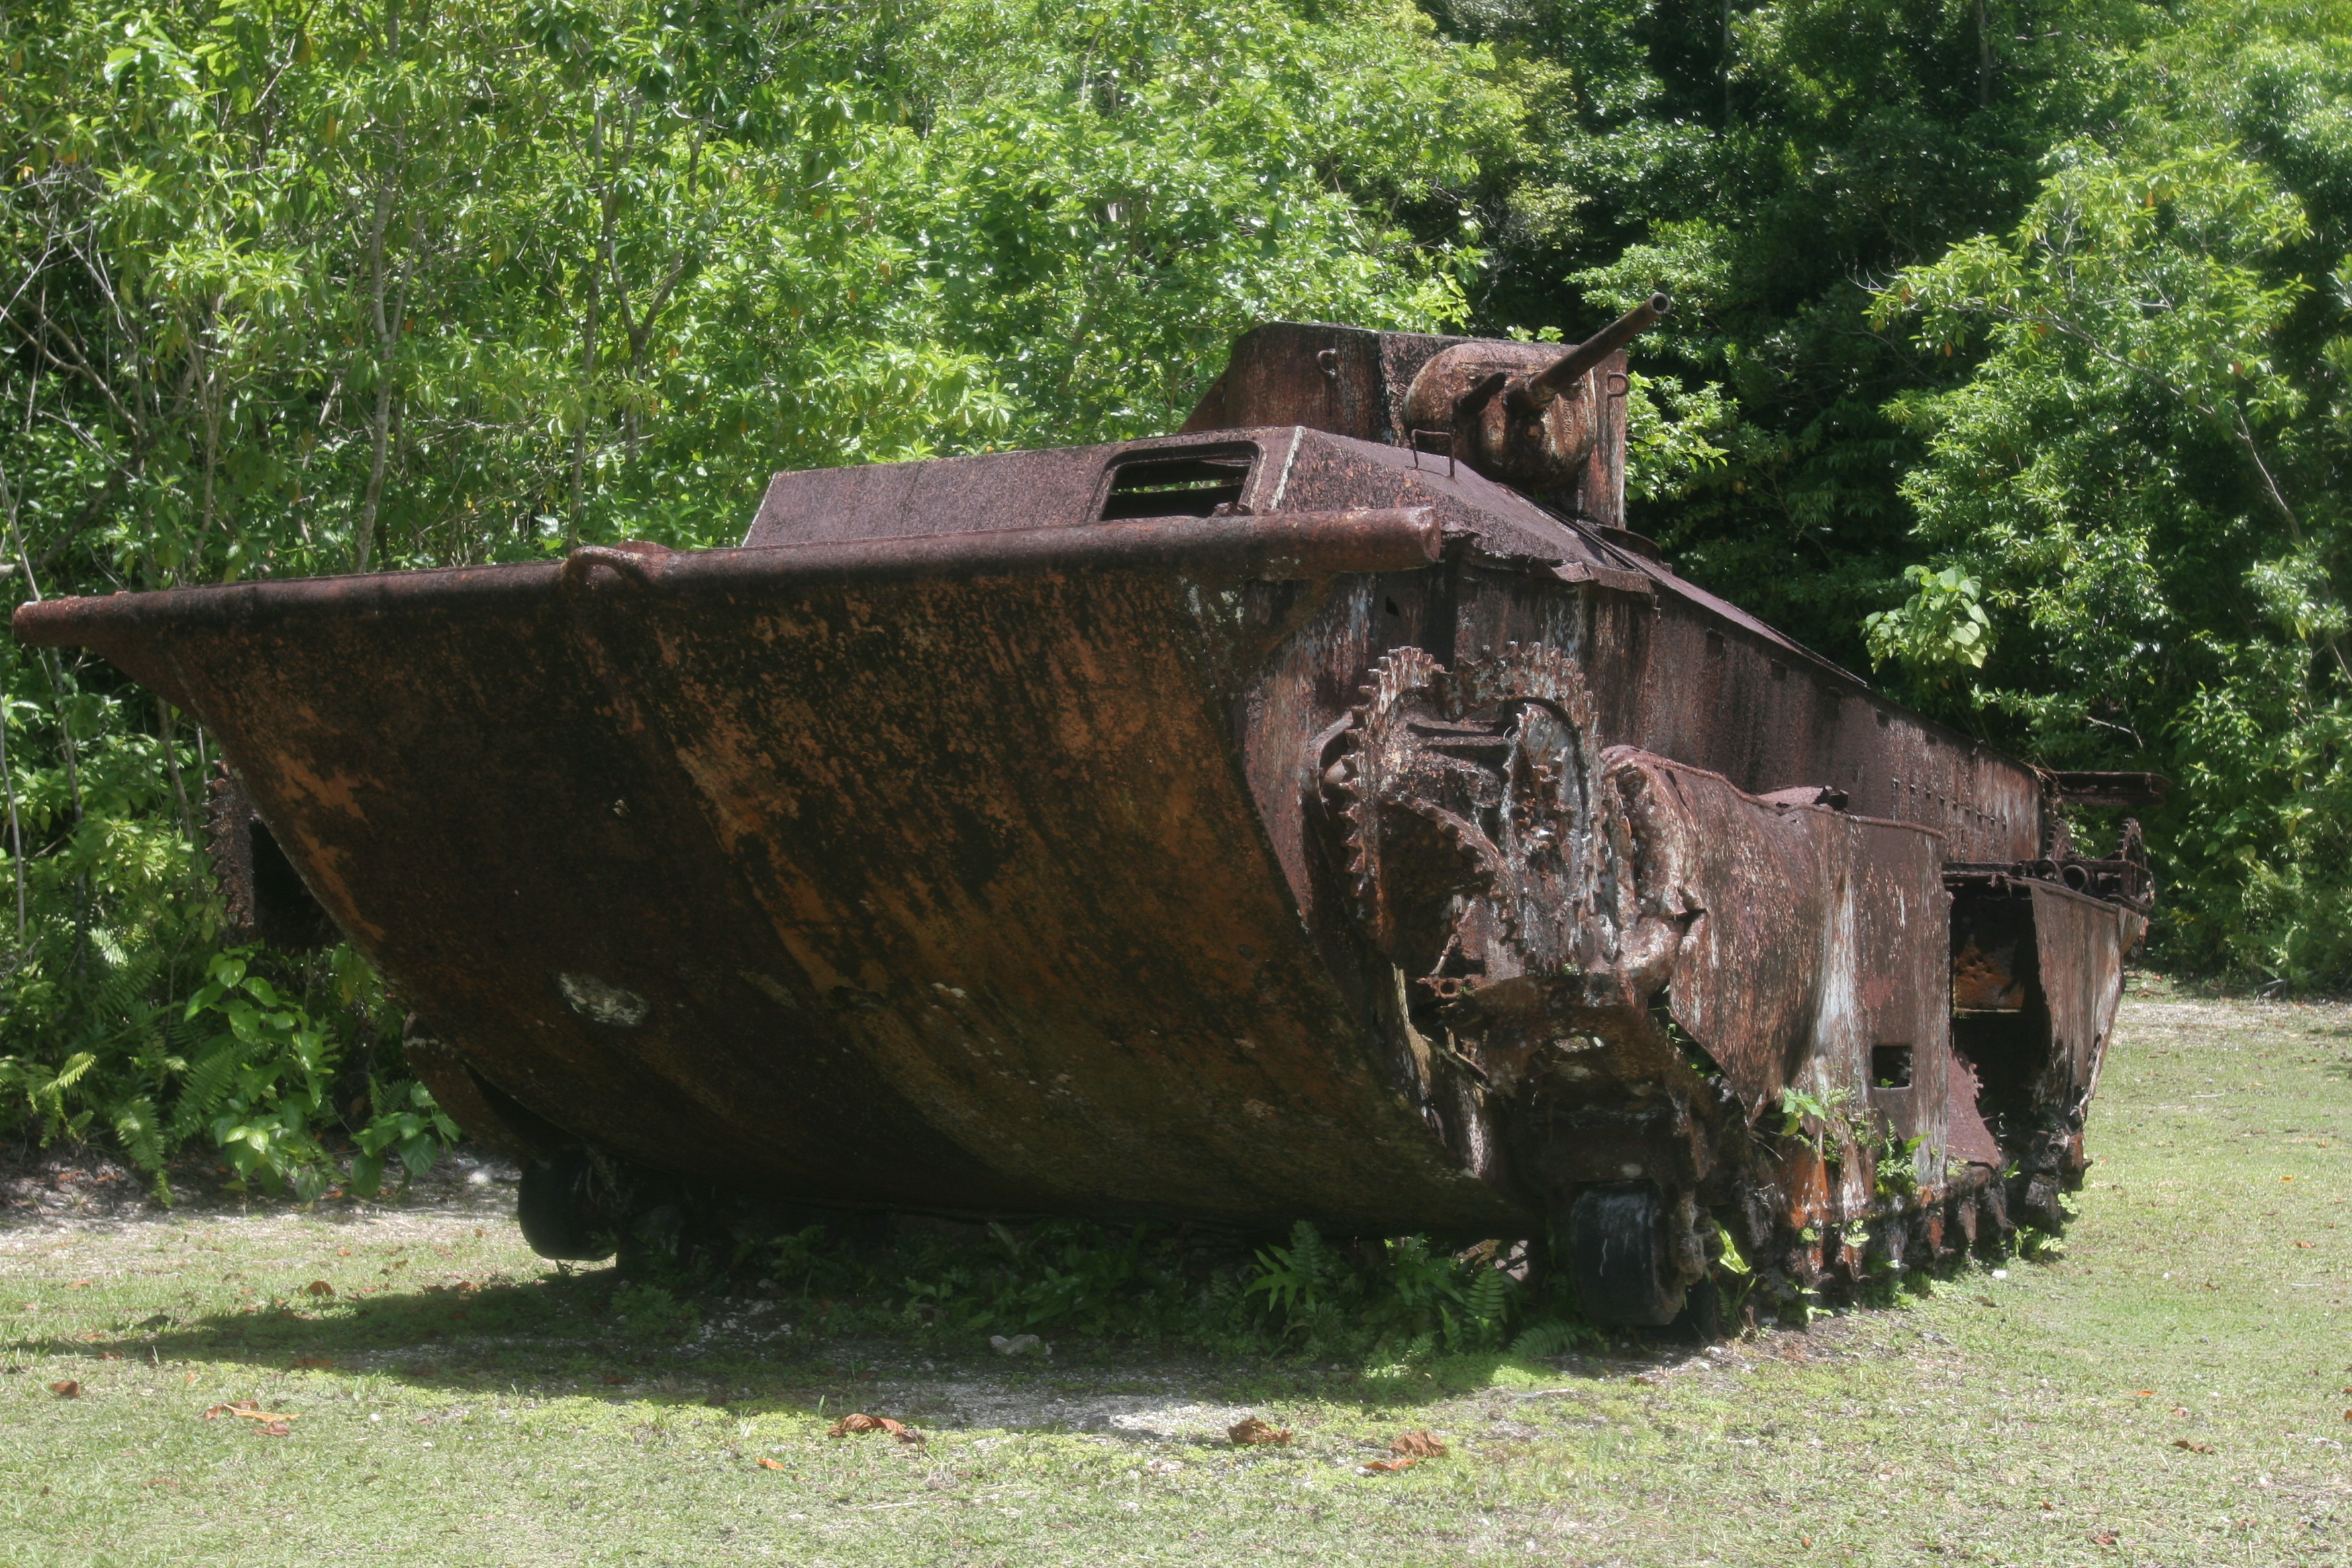 File:The forgotten battle of WWII, Okinawa based Marines step back